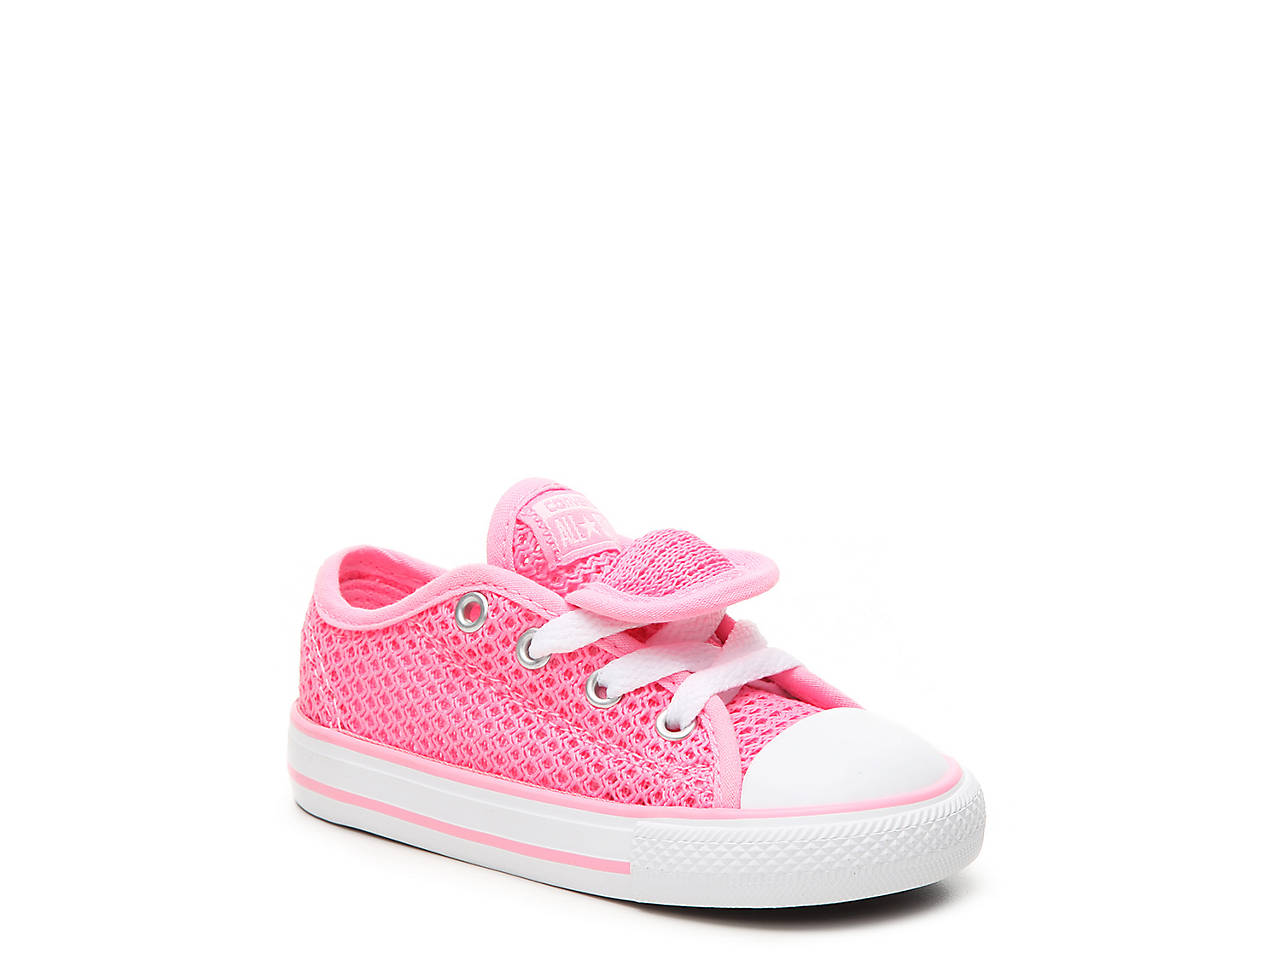 9363e959cc4 Converse. Chuck Taylor All Star Double Tongue Infant   Toddler Sneaker